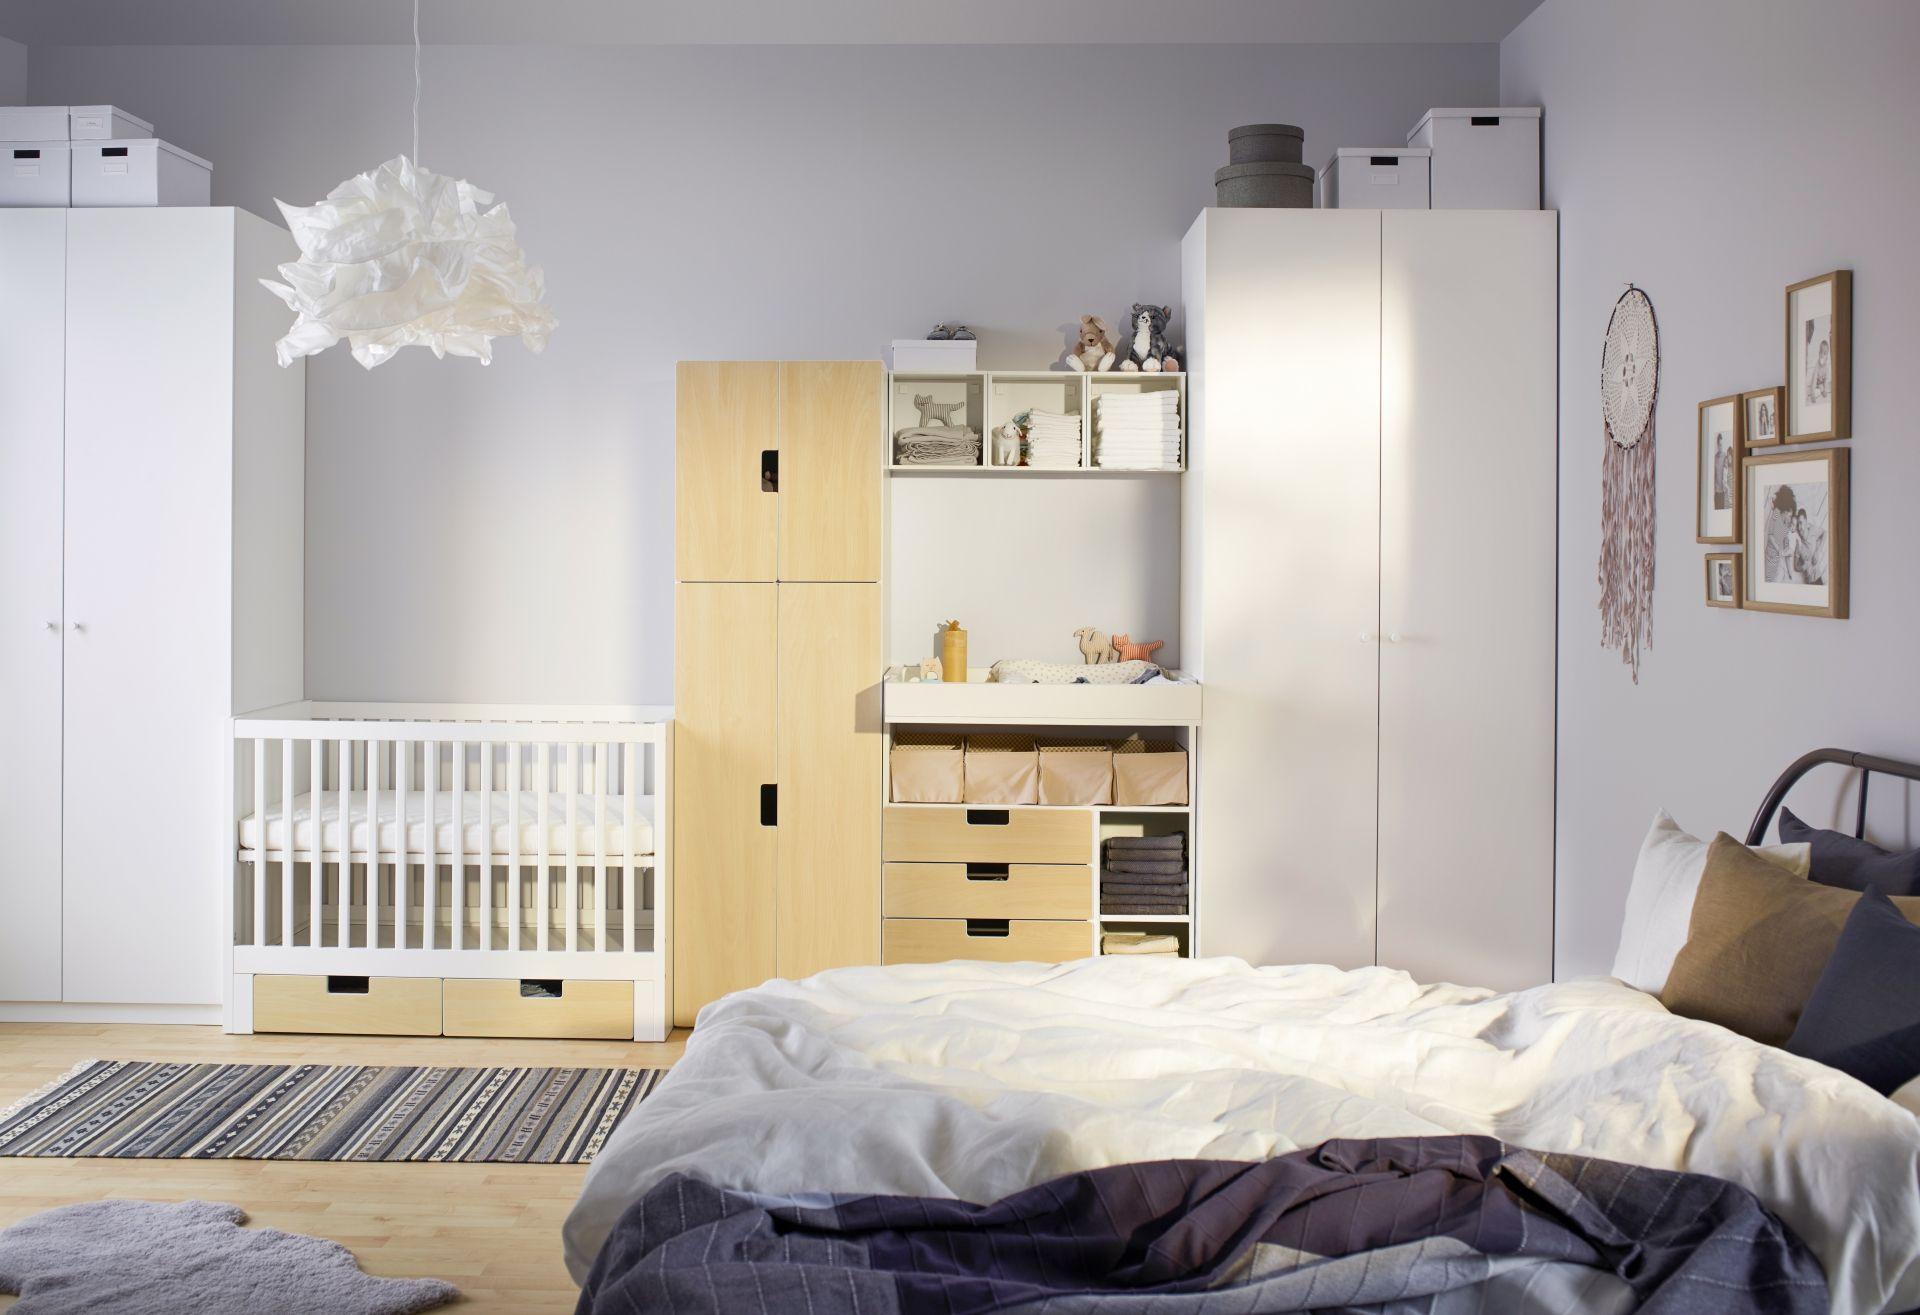 Baby Slaapkamer Ikea : Pax garderobekast ikeacatalogus nieuw ikea ikeanl